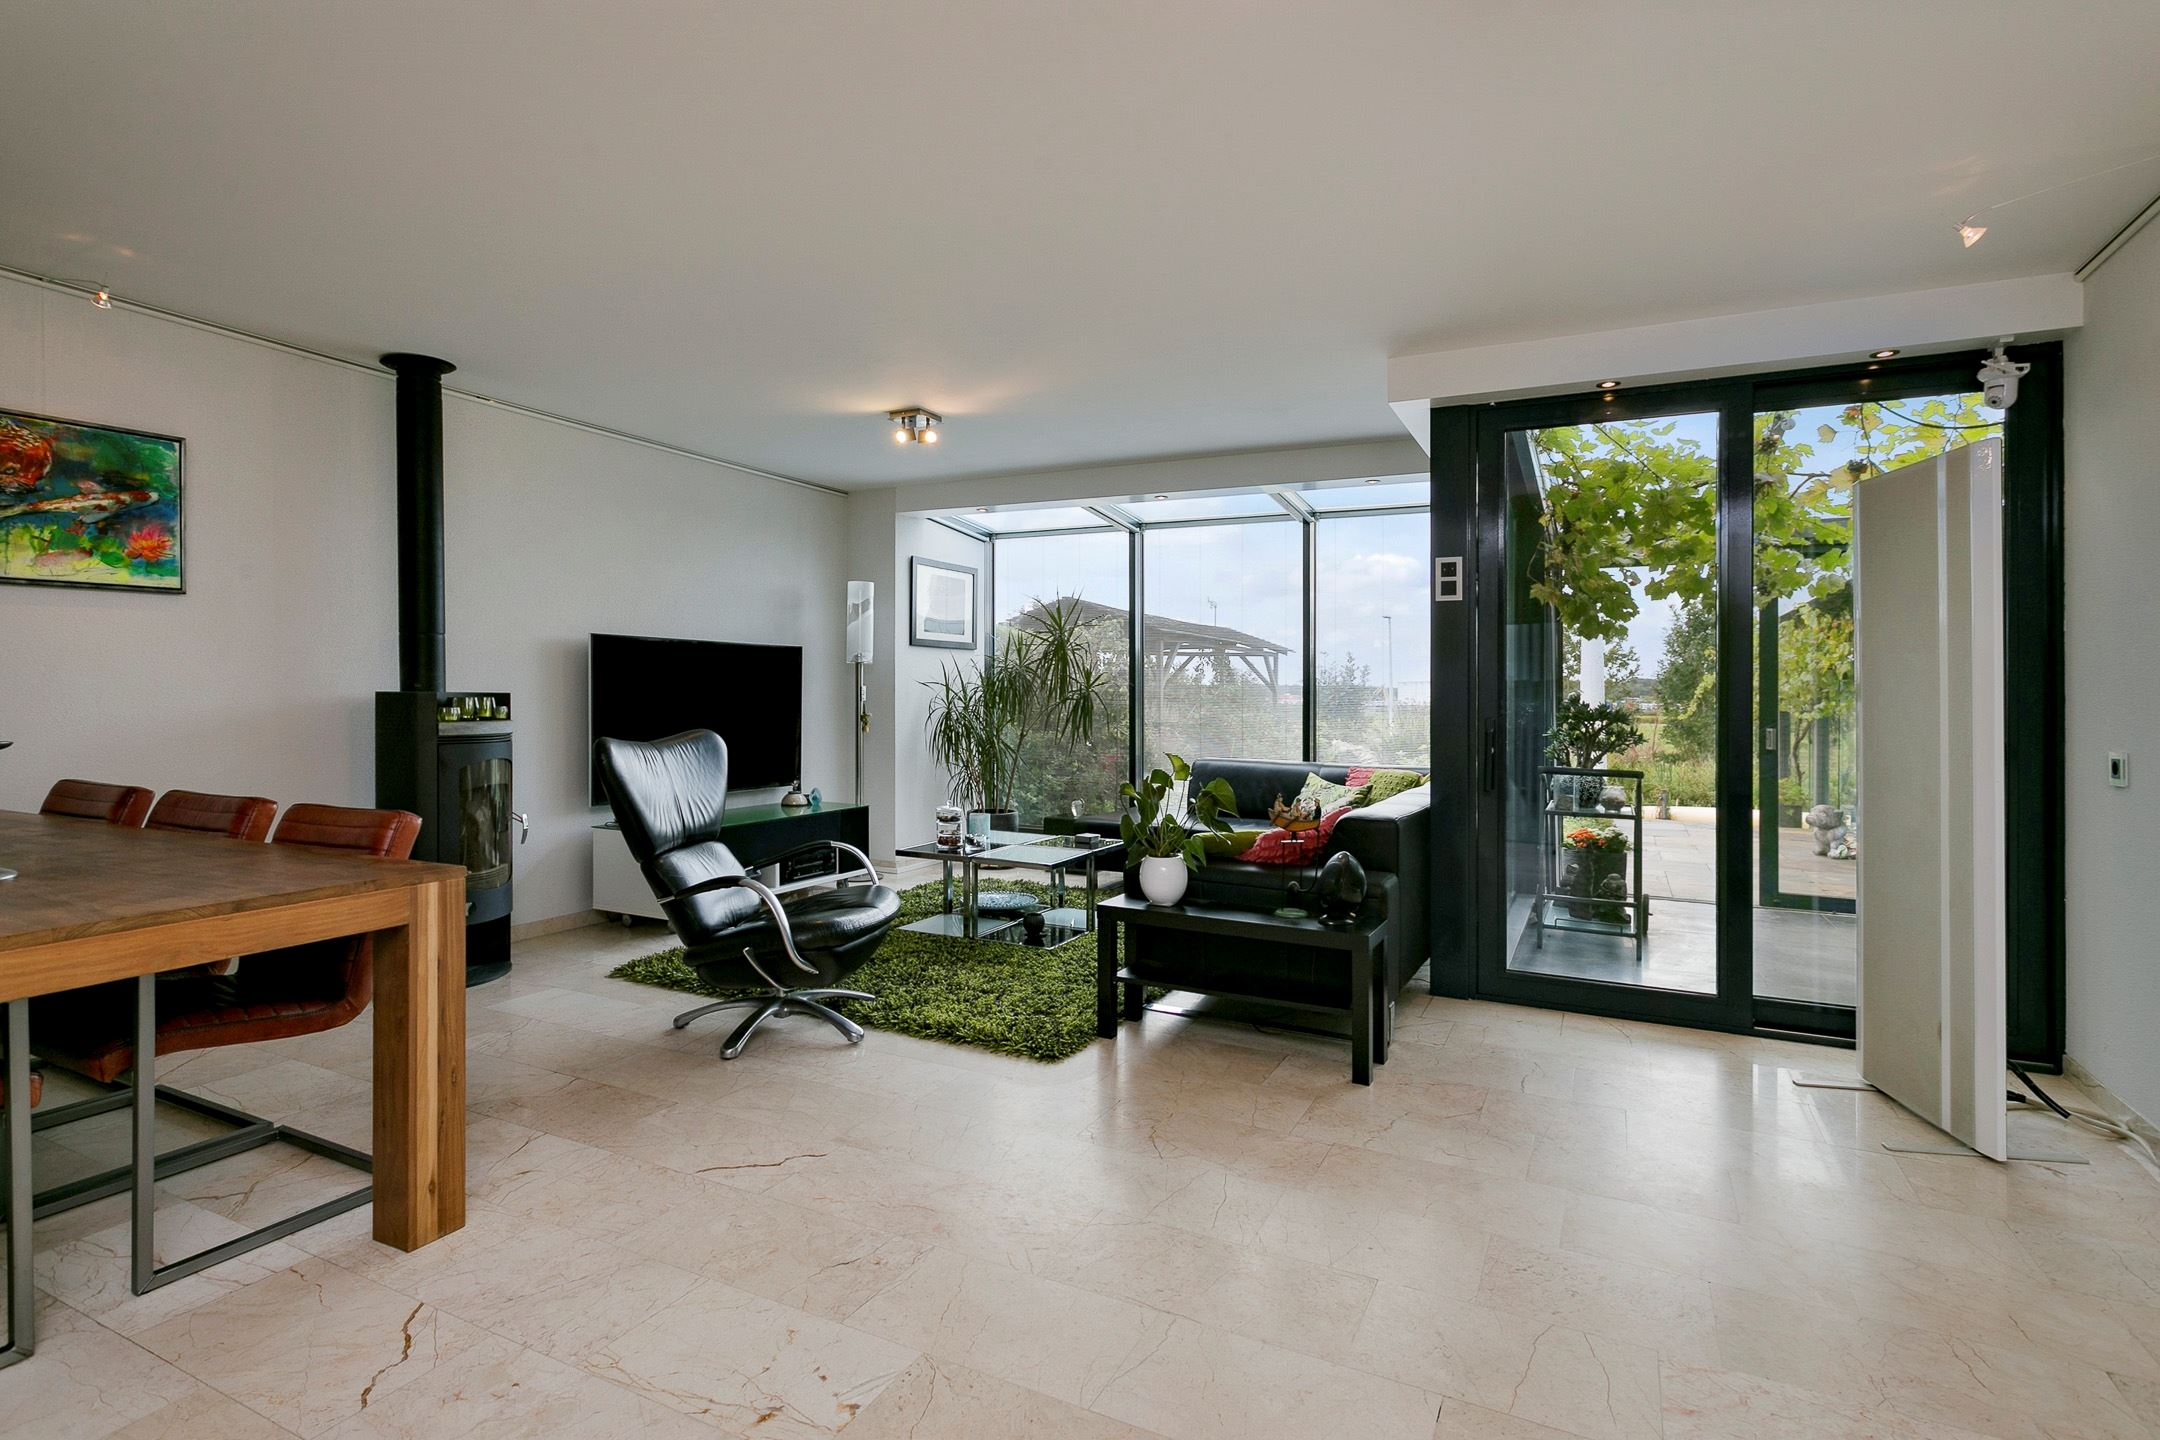 Huis te koop: maria rutgersweg 104 2331 nx leiden [funda]